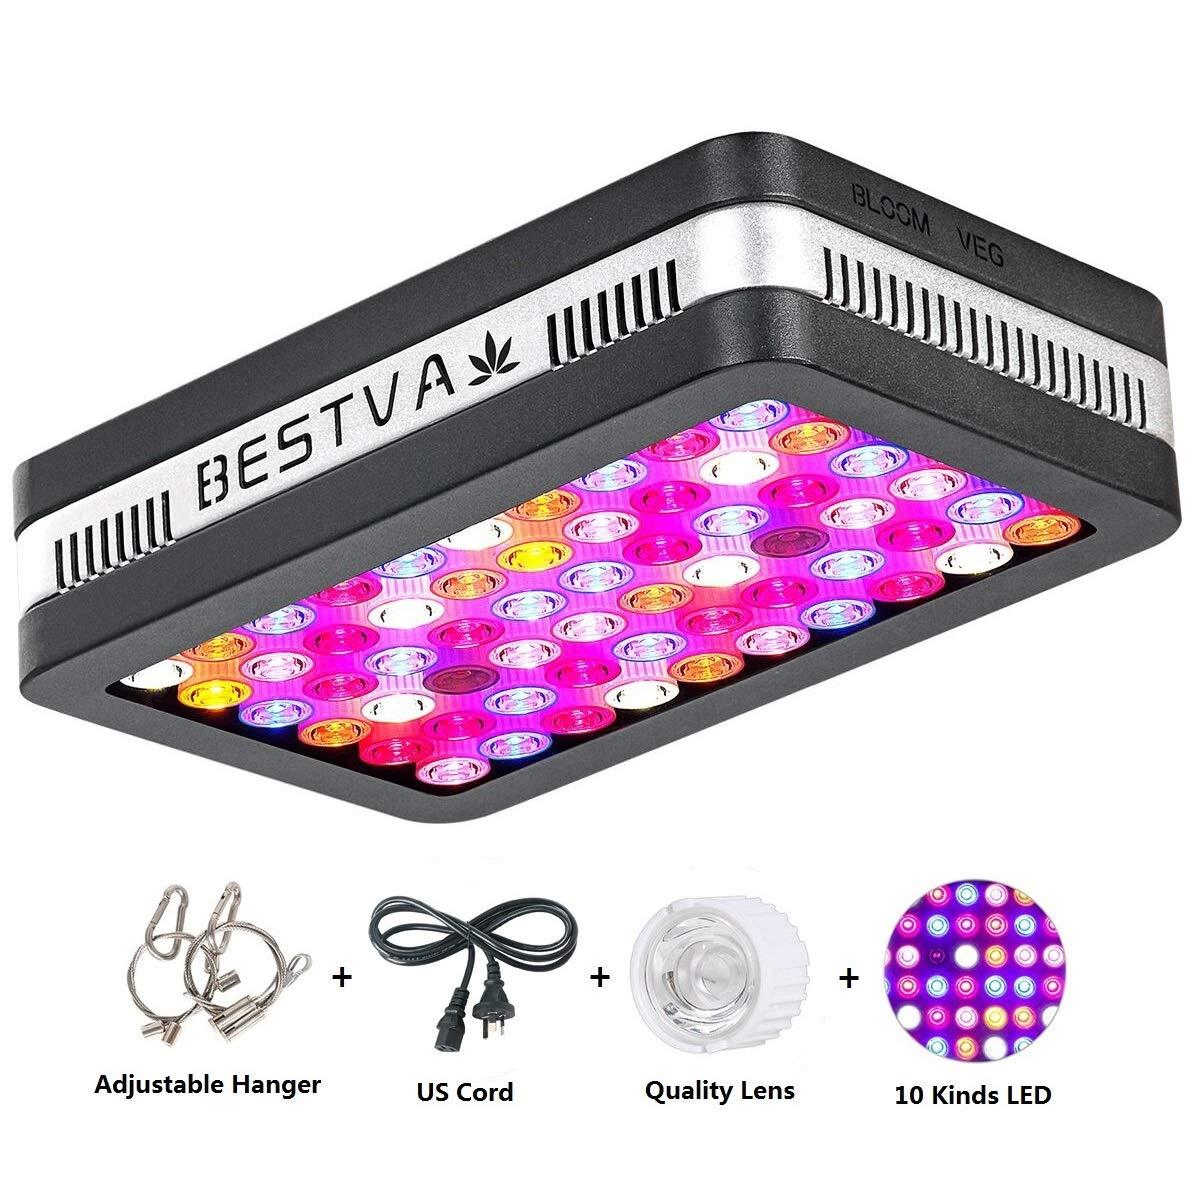 BESTVA Reflector Series 600W LED Grow Light Full Spectrum Grow Lamp for Hydroponic Indoor Plants Veg and Flower (Elite-600W) by BESTVA